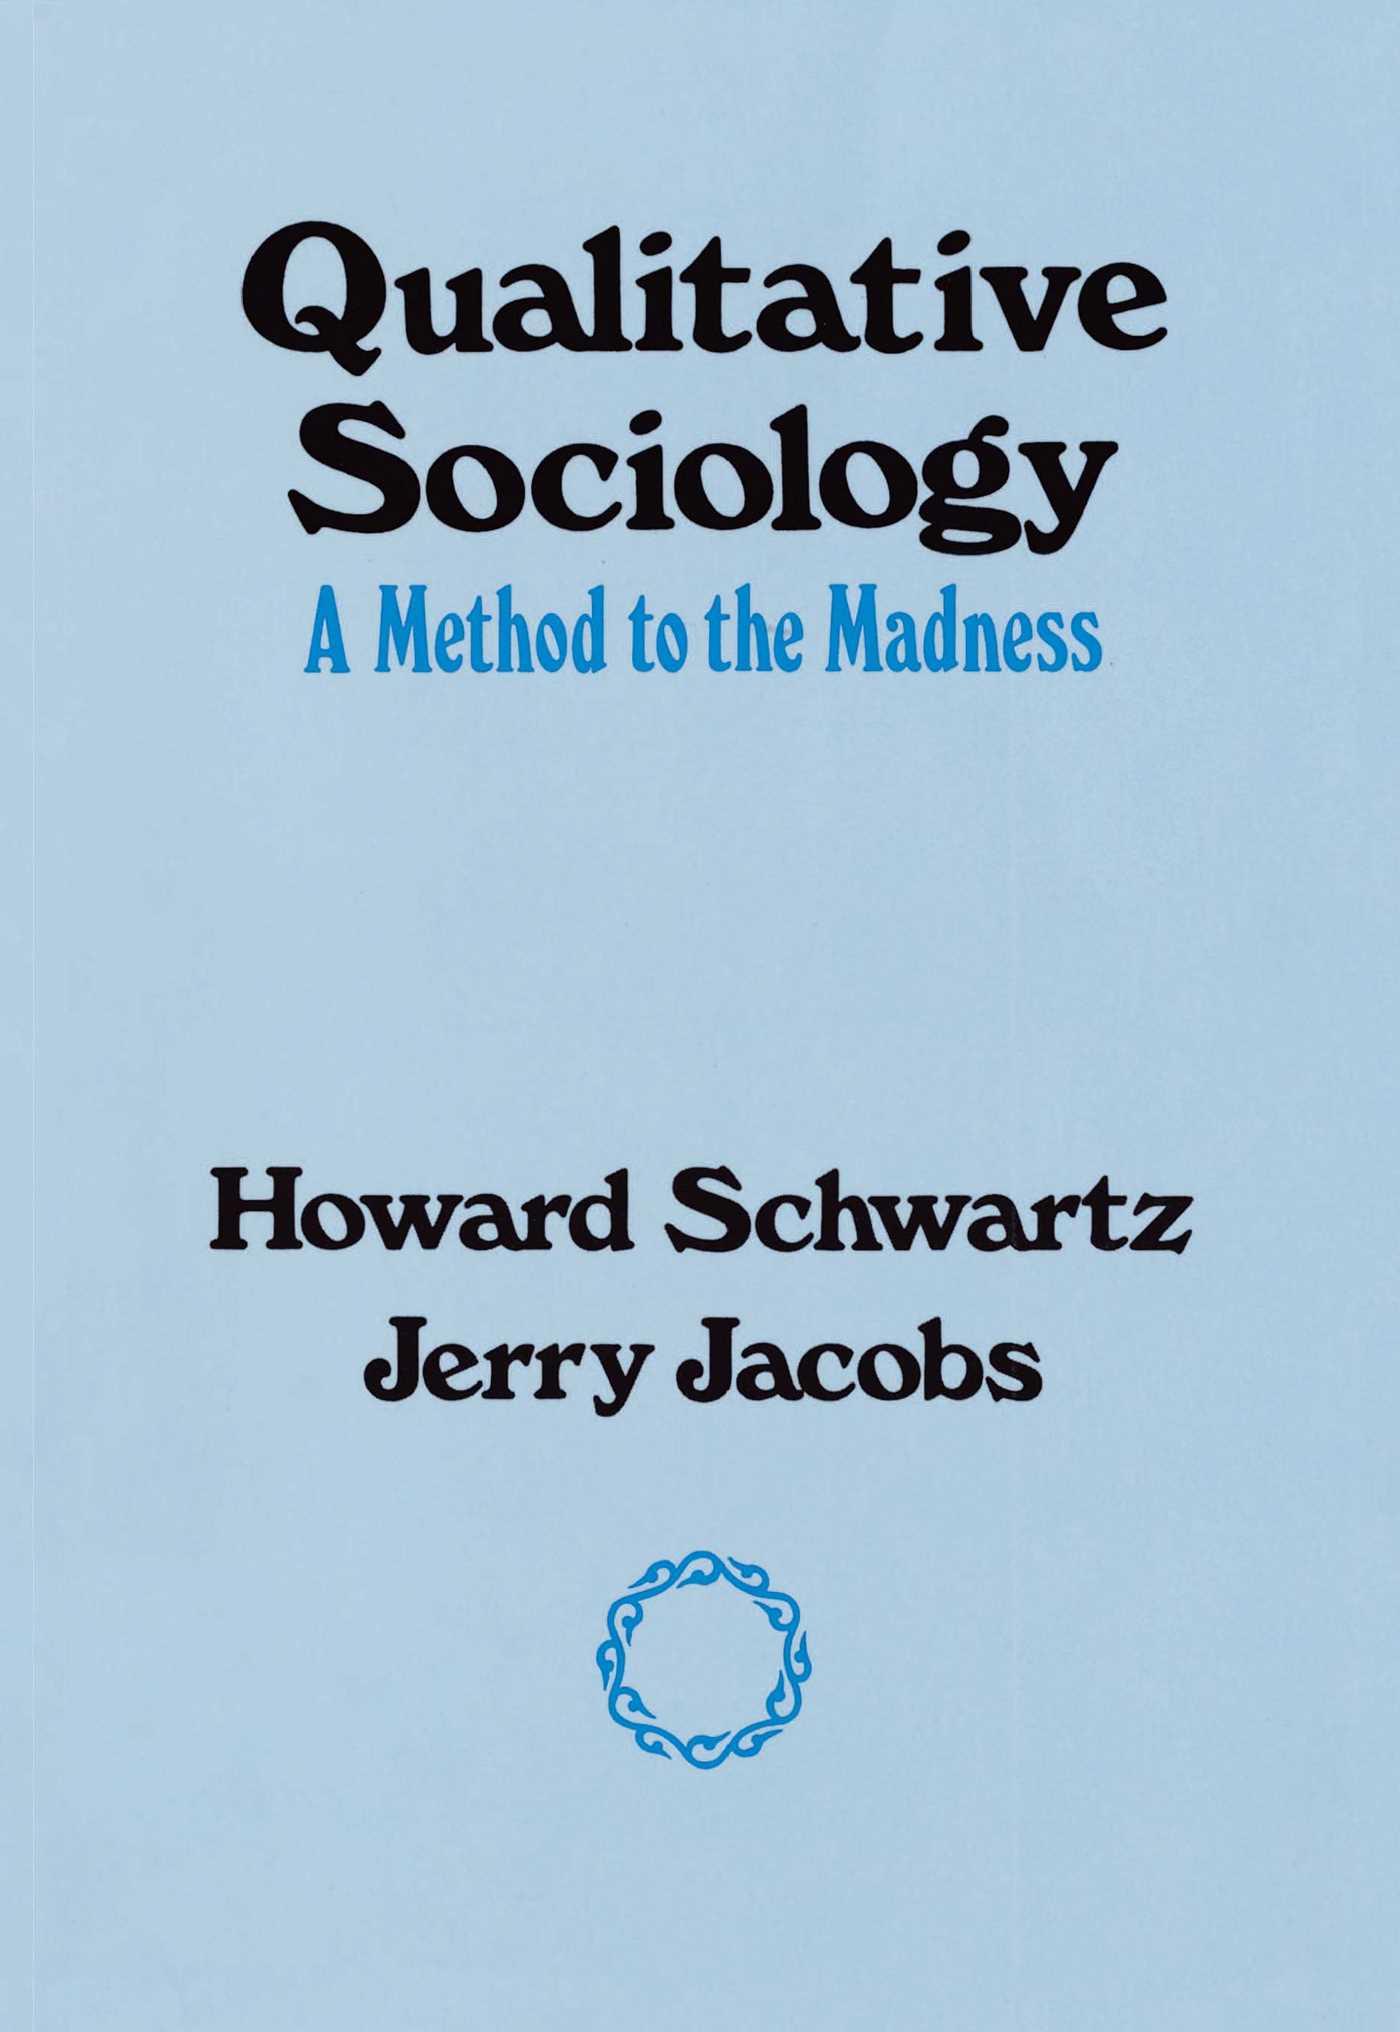 Qualitative sociology 9780029281604 hr